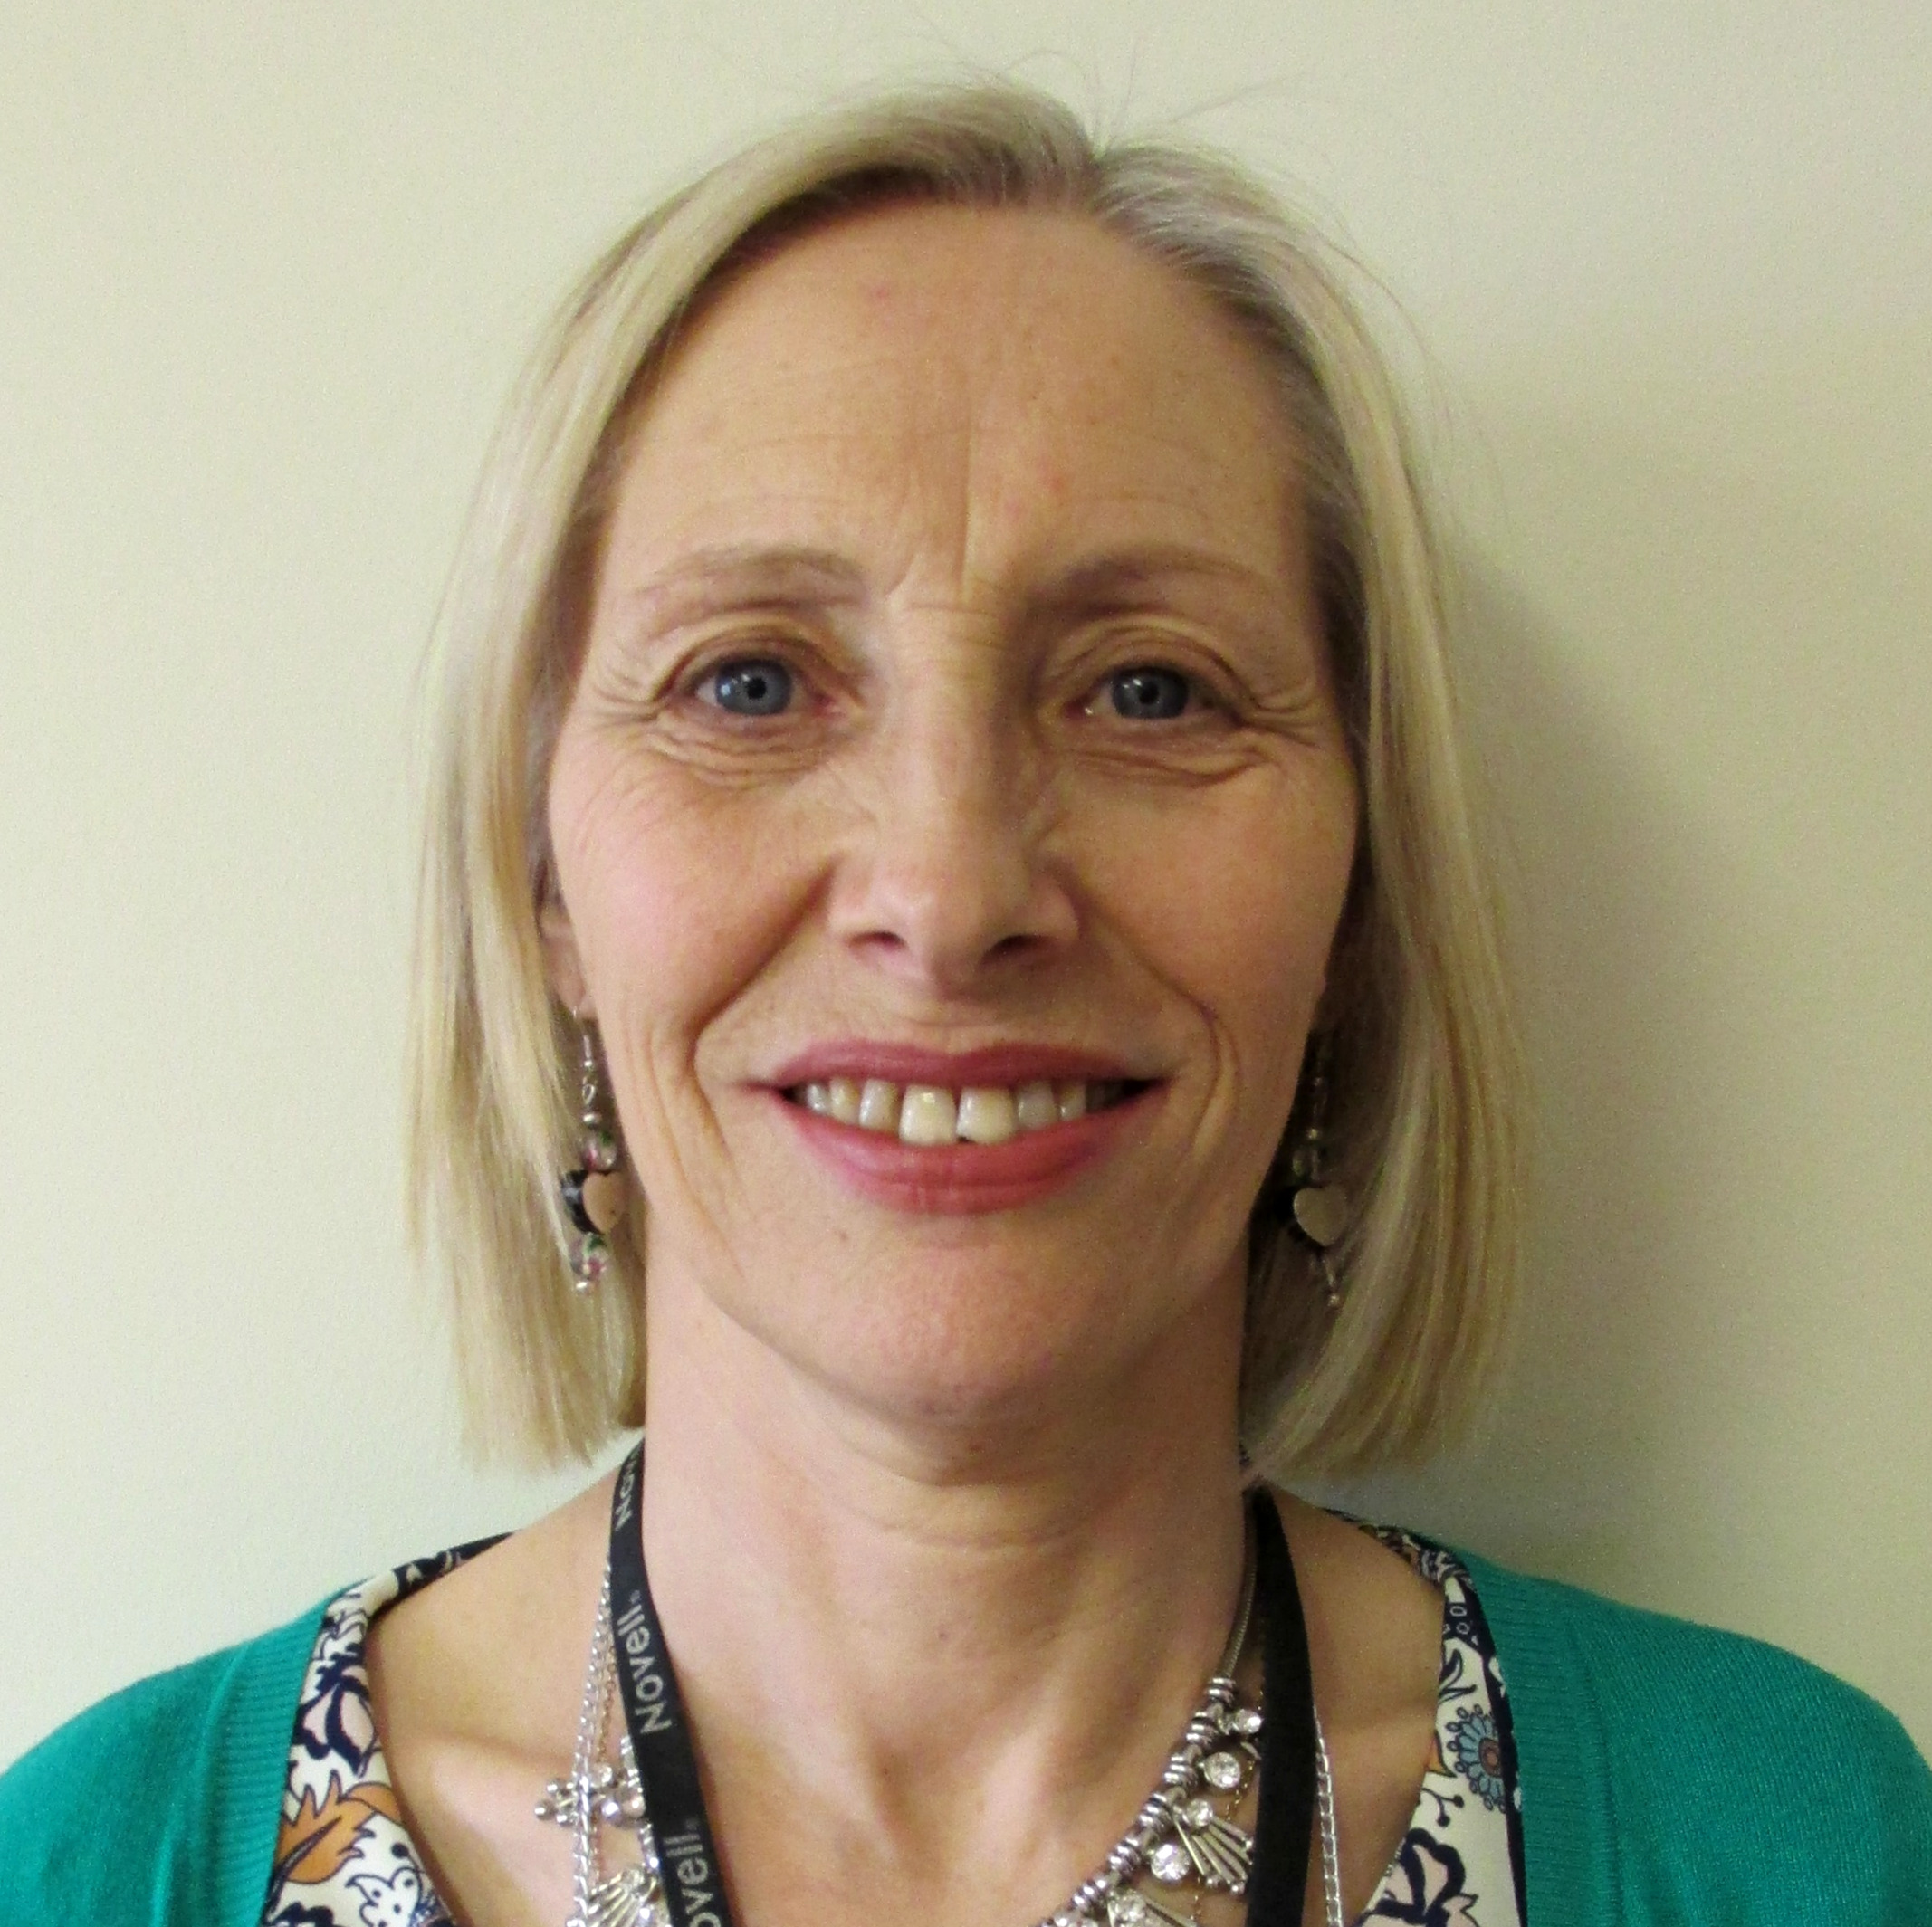 An Image of the Quality Assurance Teresa Pilkington